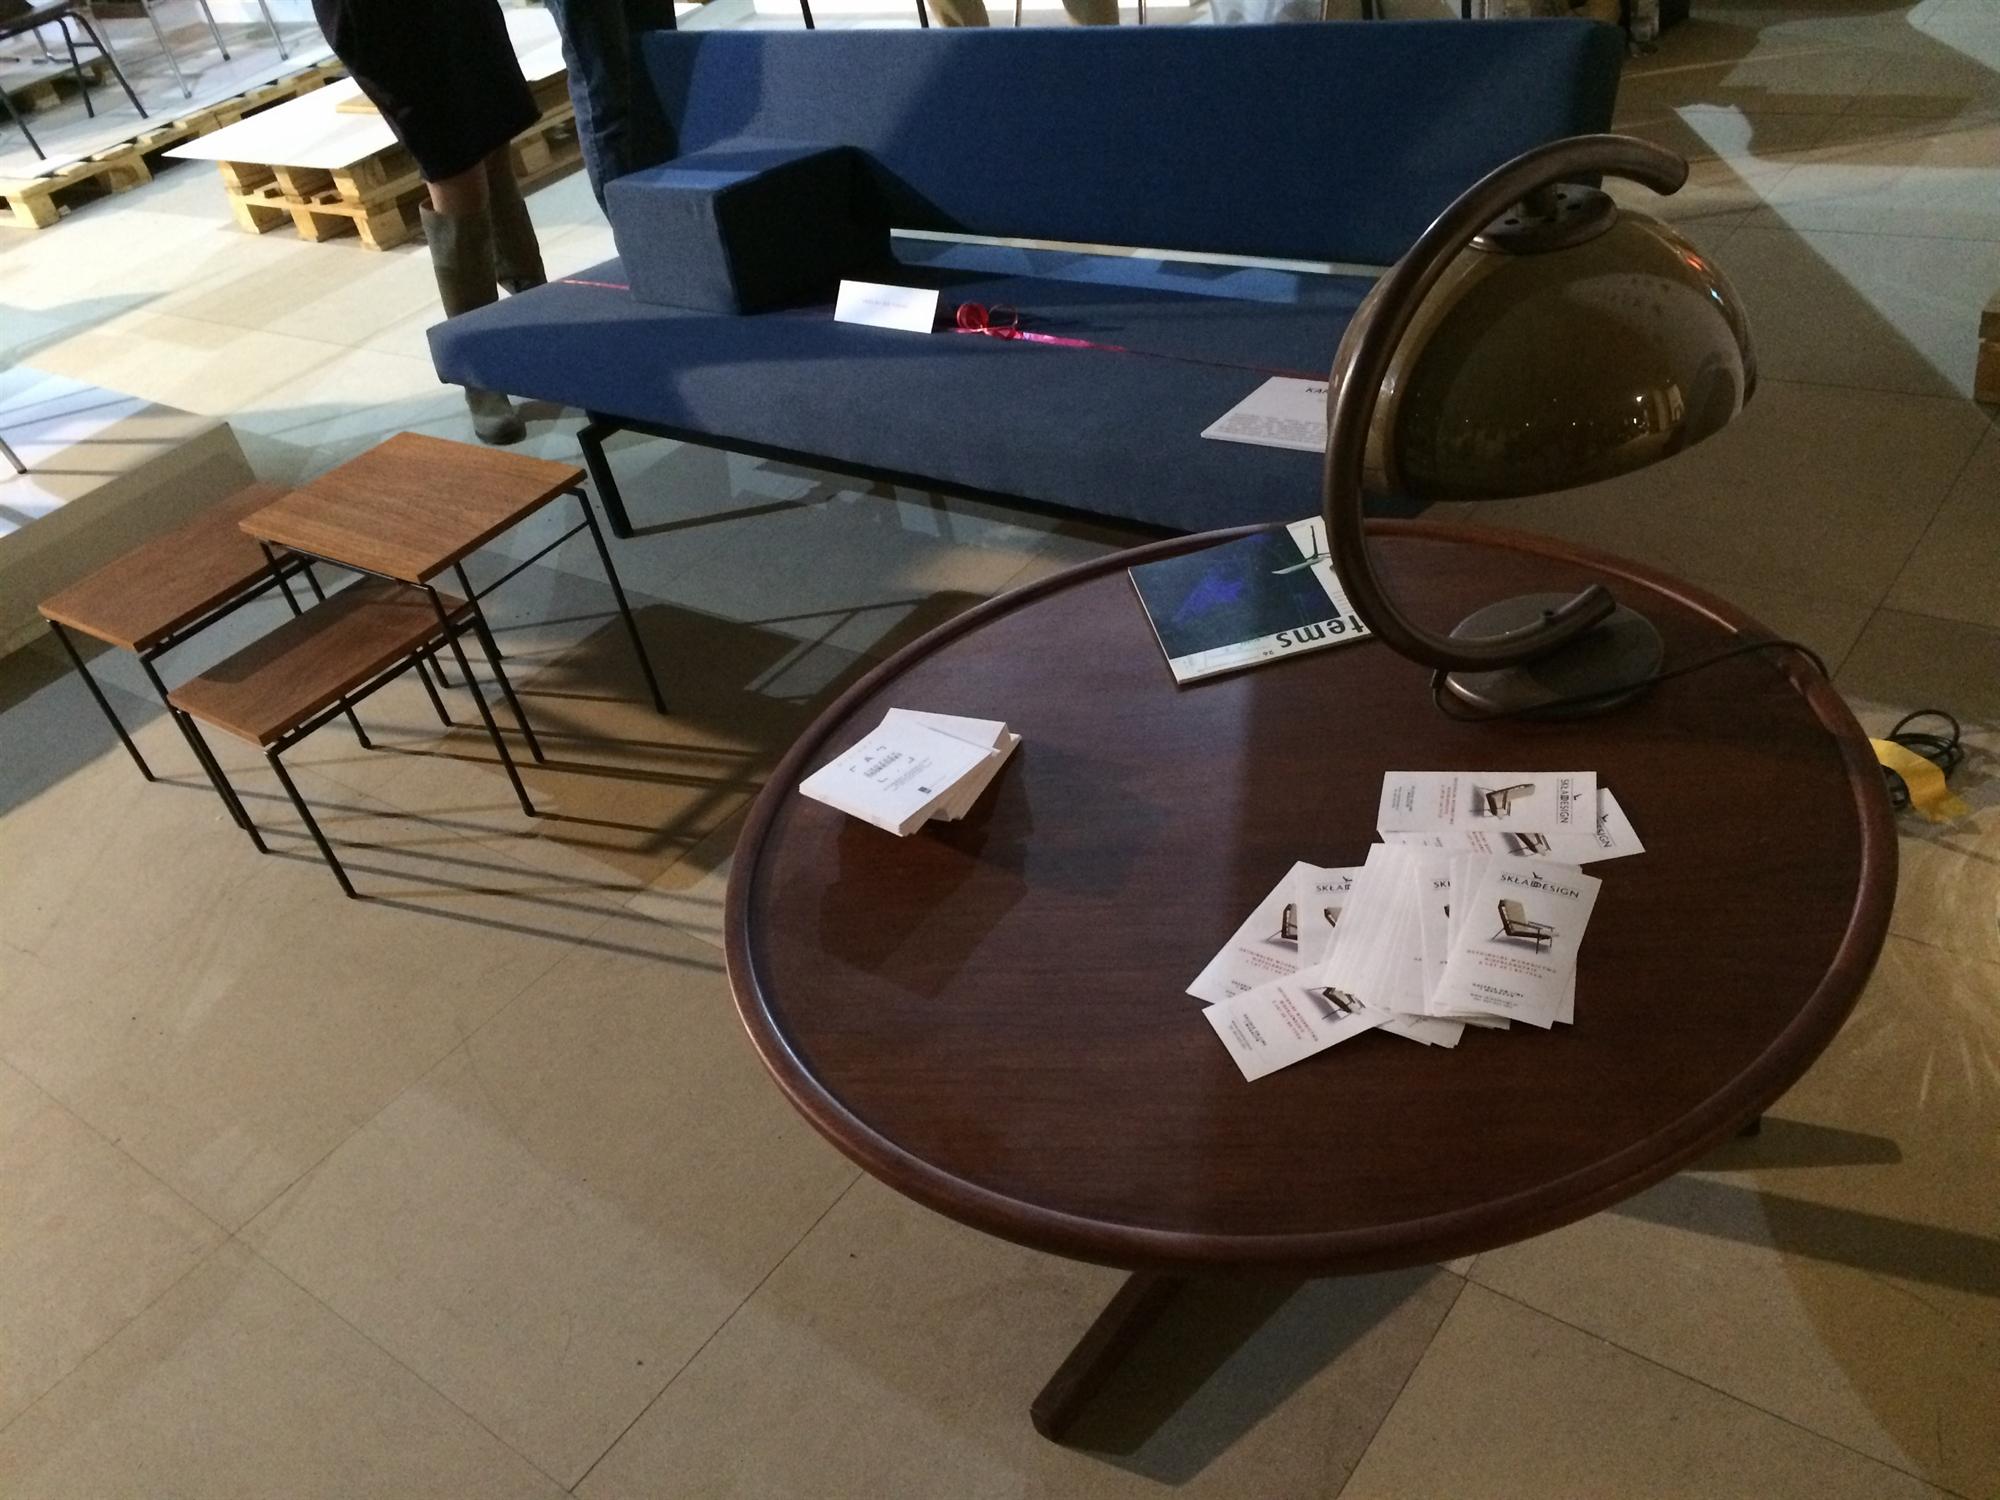 8 targi_rzeczy_ladnych_best_polish_design_fair_pretty_things_interior_design_home_decorating_ideas_modern_furniture_vintage_style_apartment_polskie_projekty_nowoczesne_mieszkanie_forelements_blog